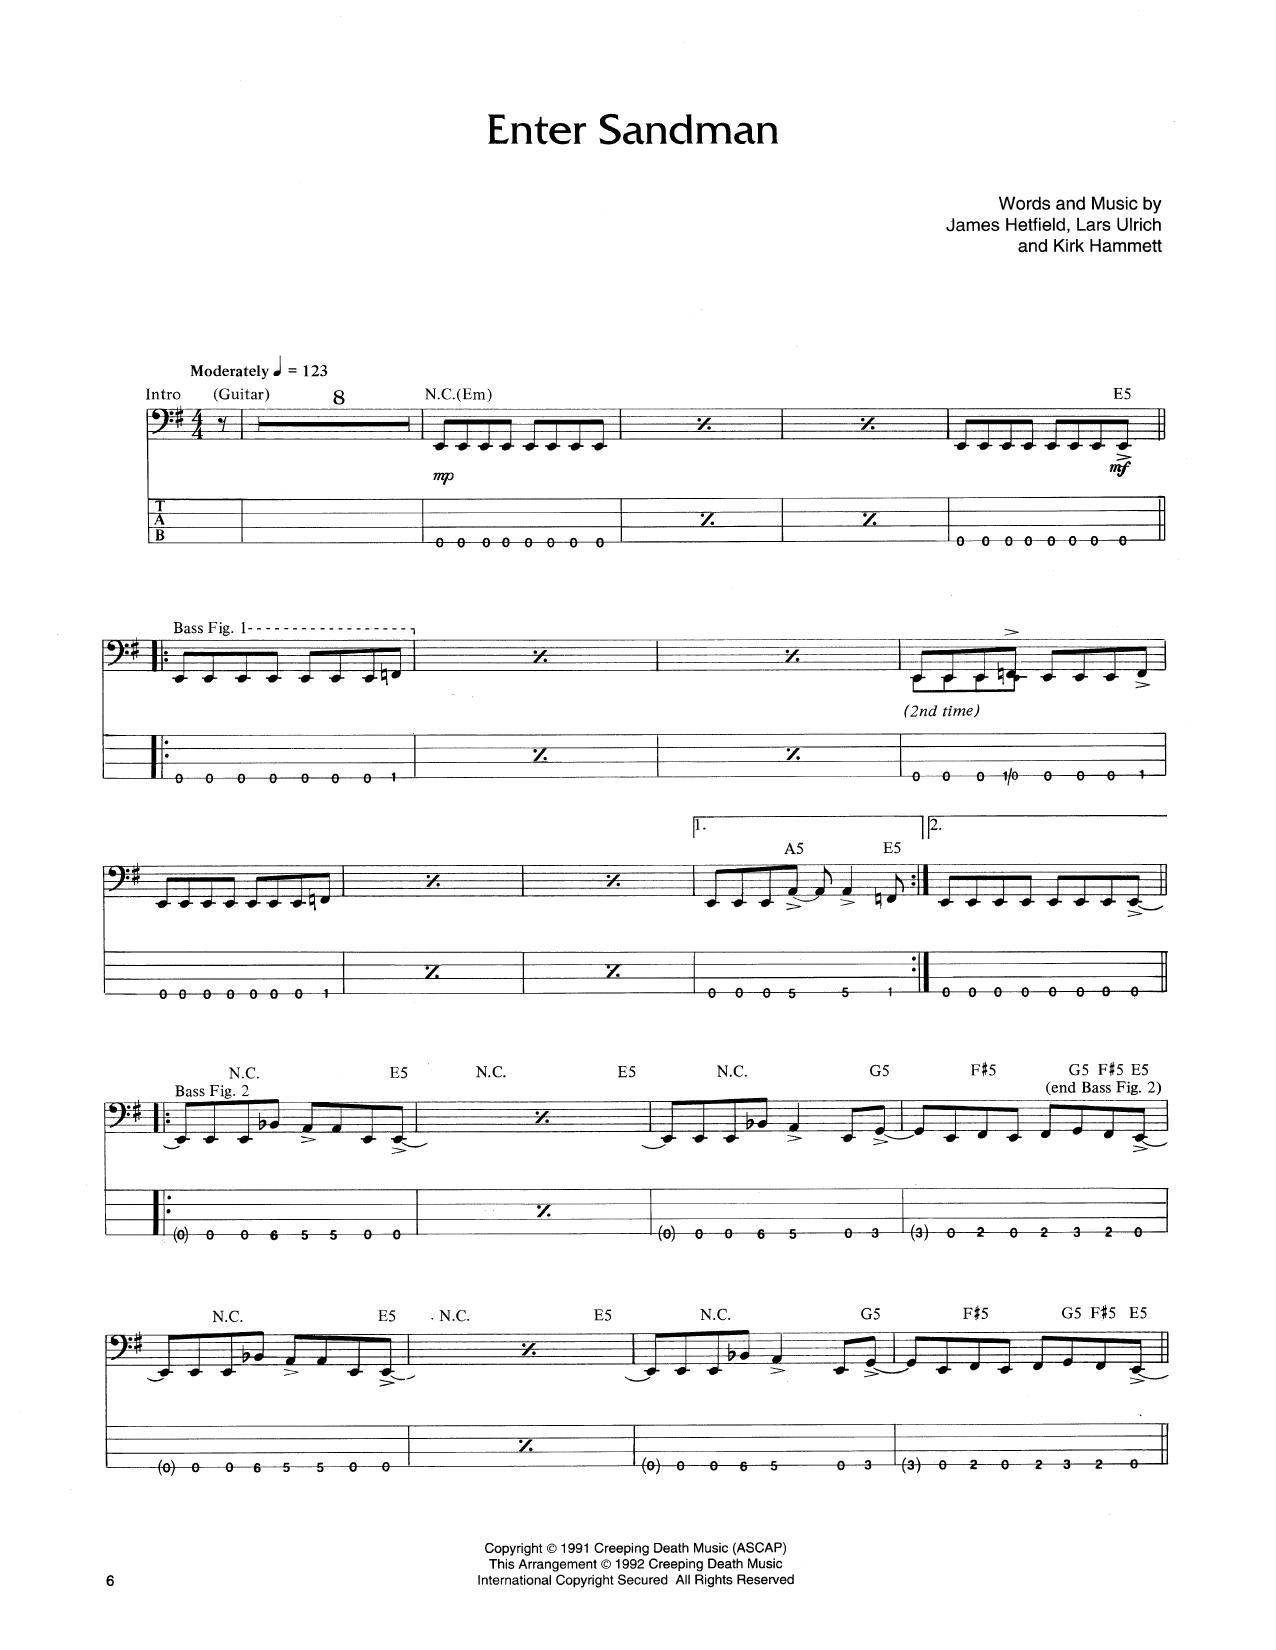 Enter Sandman Sheet Music